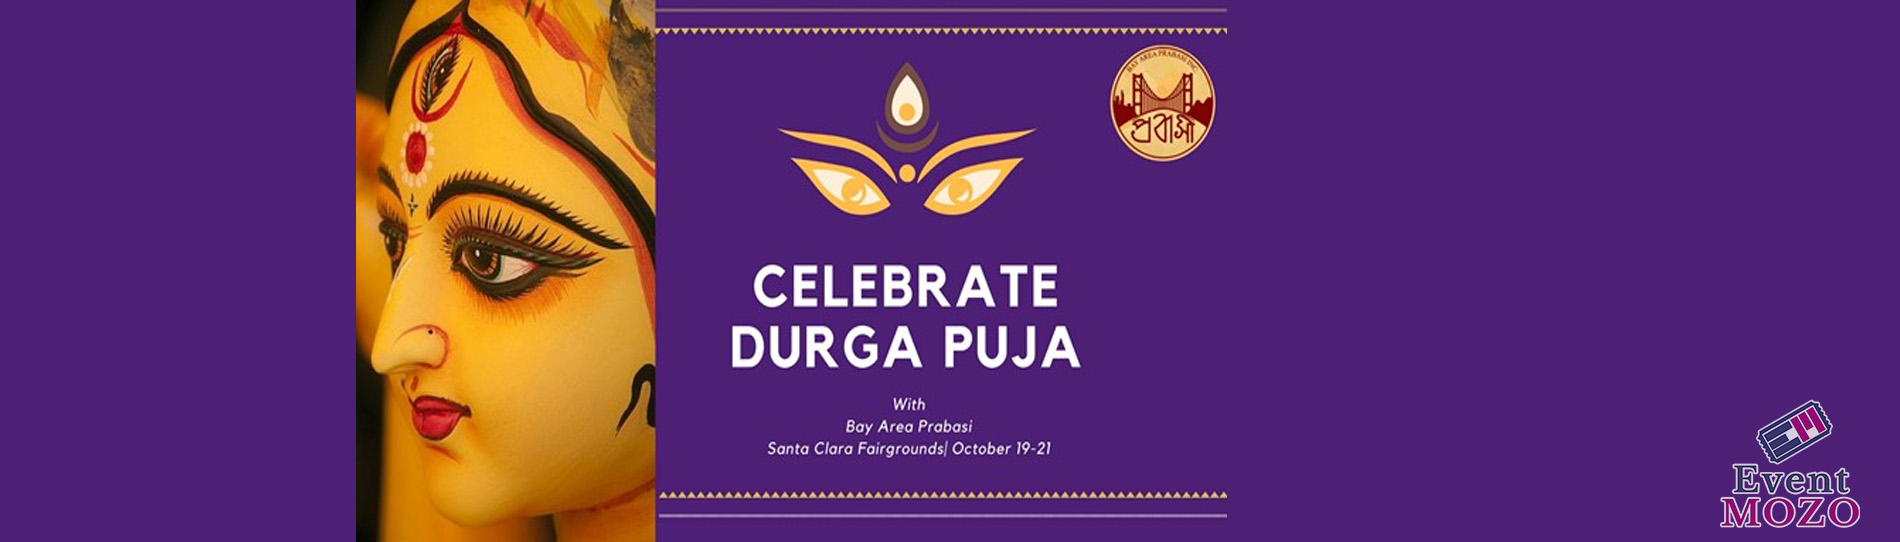 EventMozo Bay Area Prabasi Durga Puja 2018